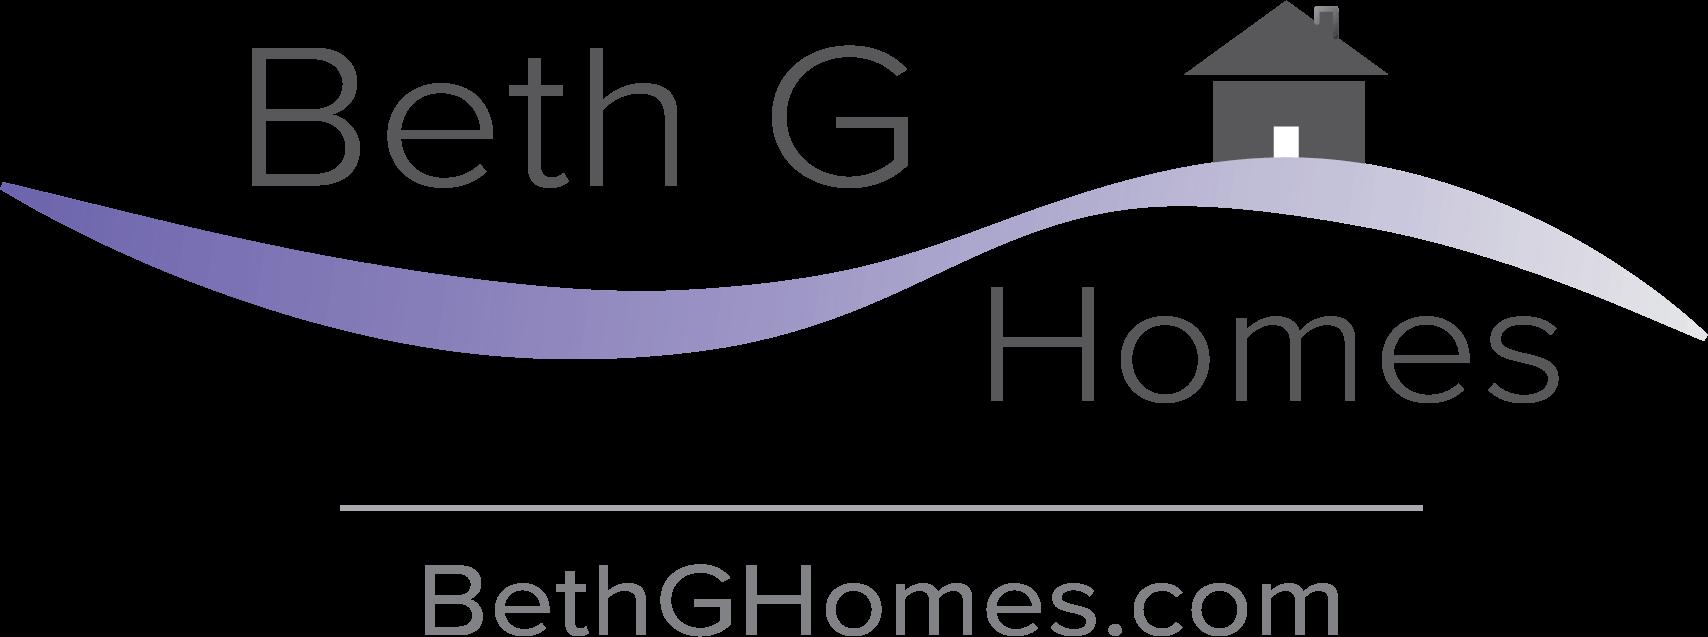 Beth G Homes